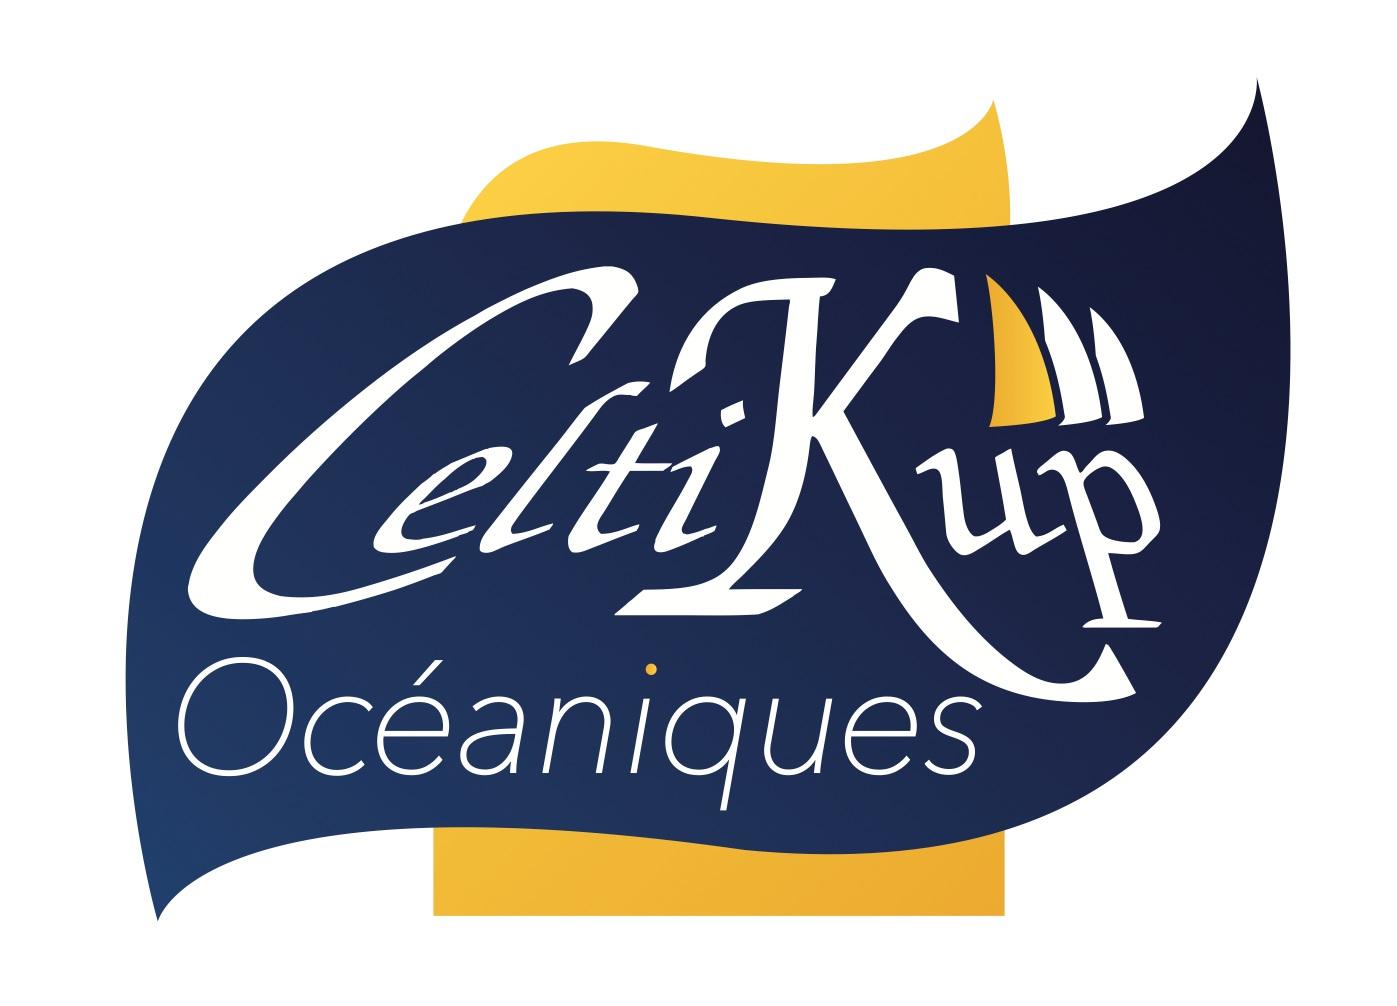 logo celtikup 2016